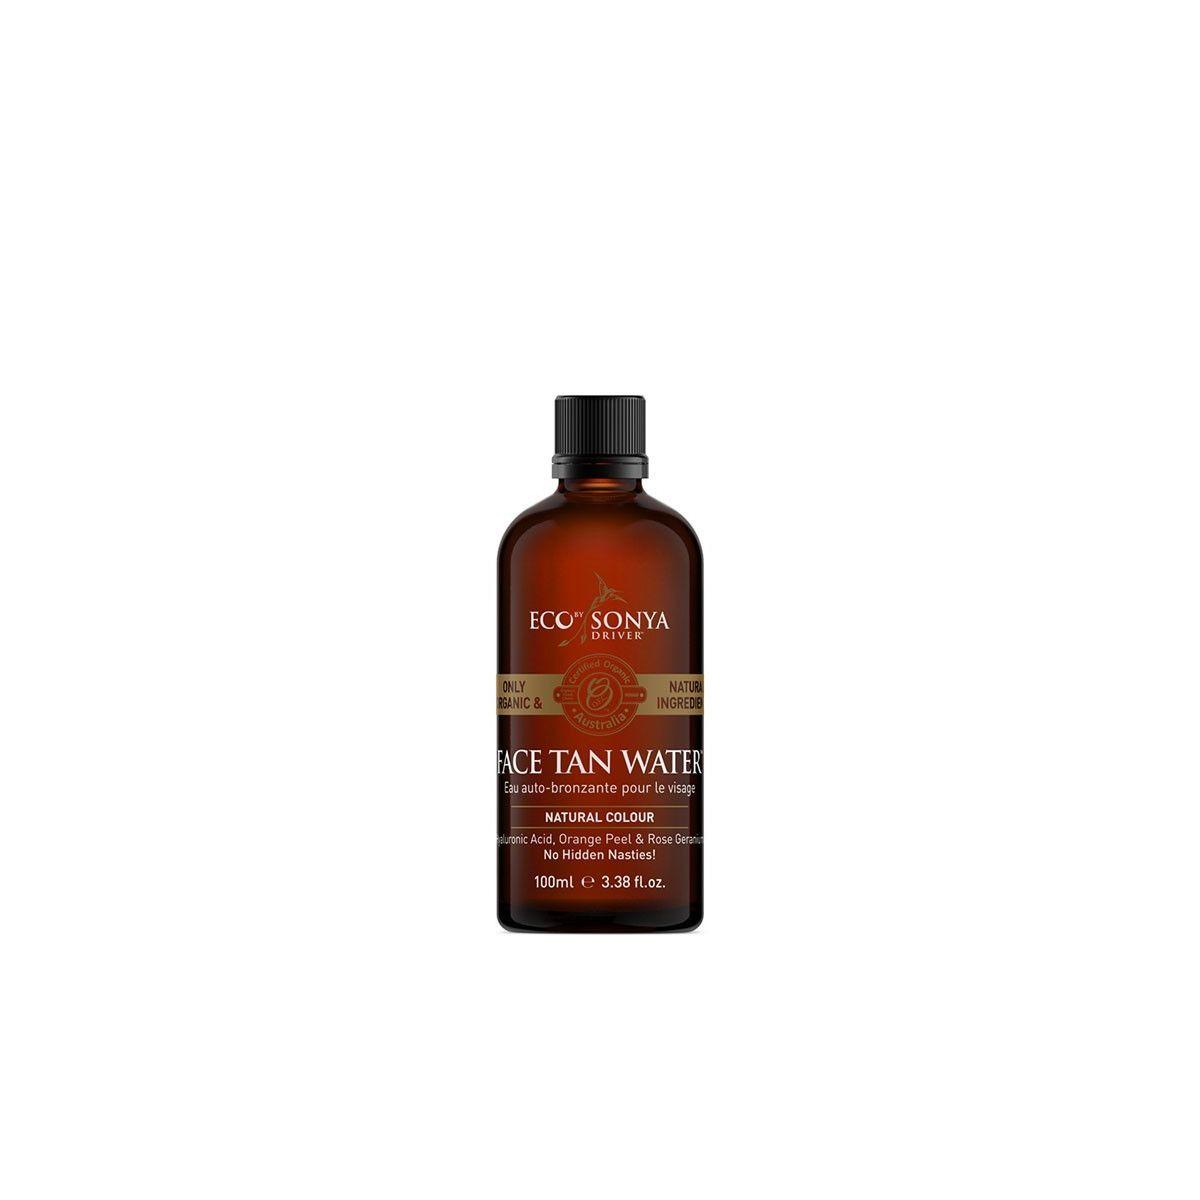 Face Tan Water - vandbaseret selvbruner